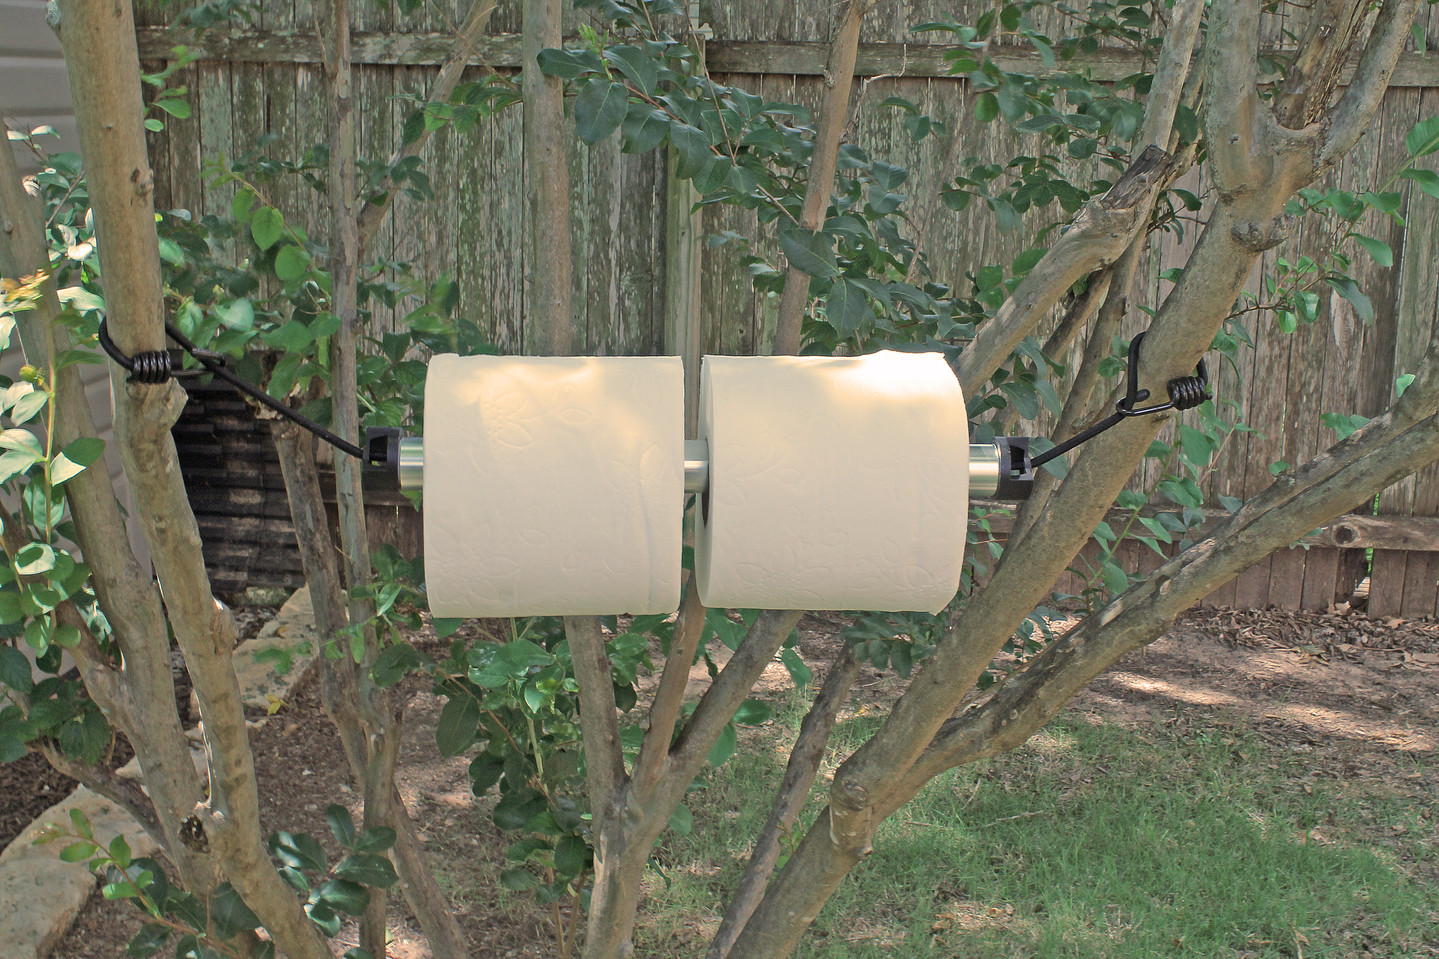 Toilet Paper_horizontal.JPG